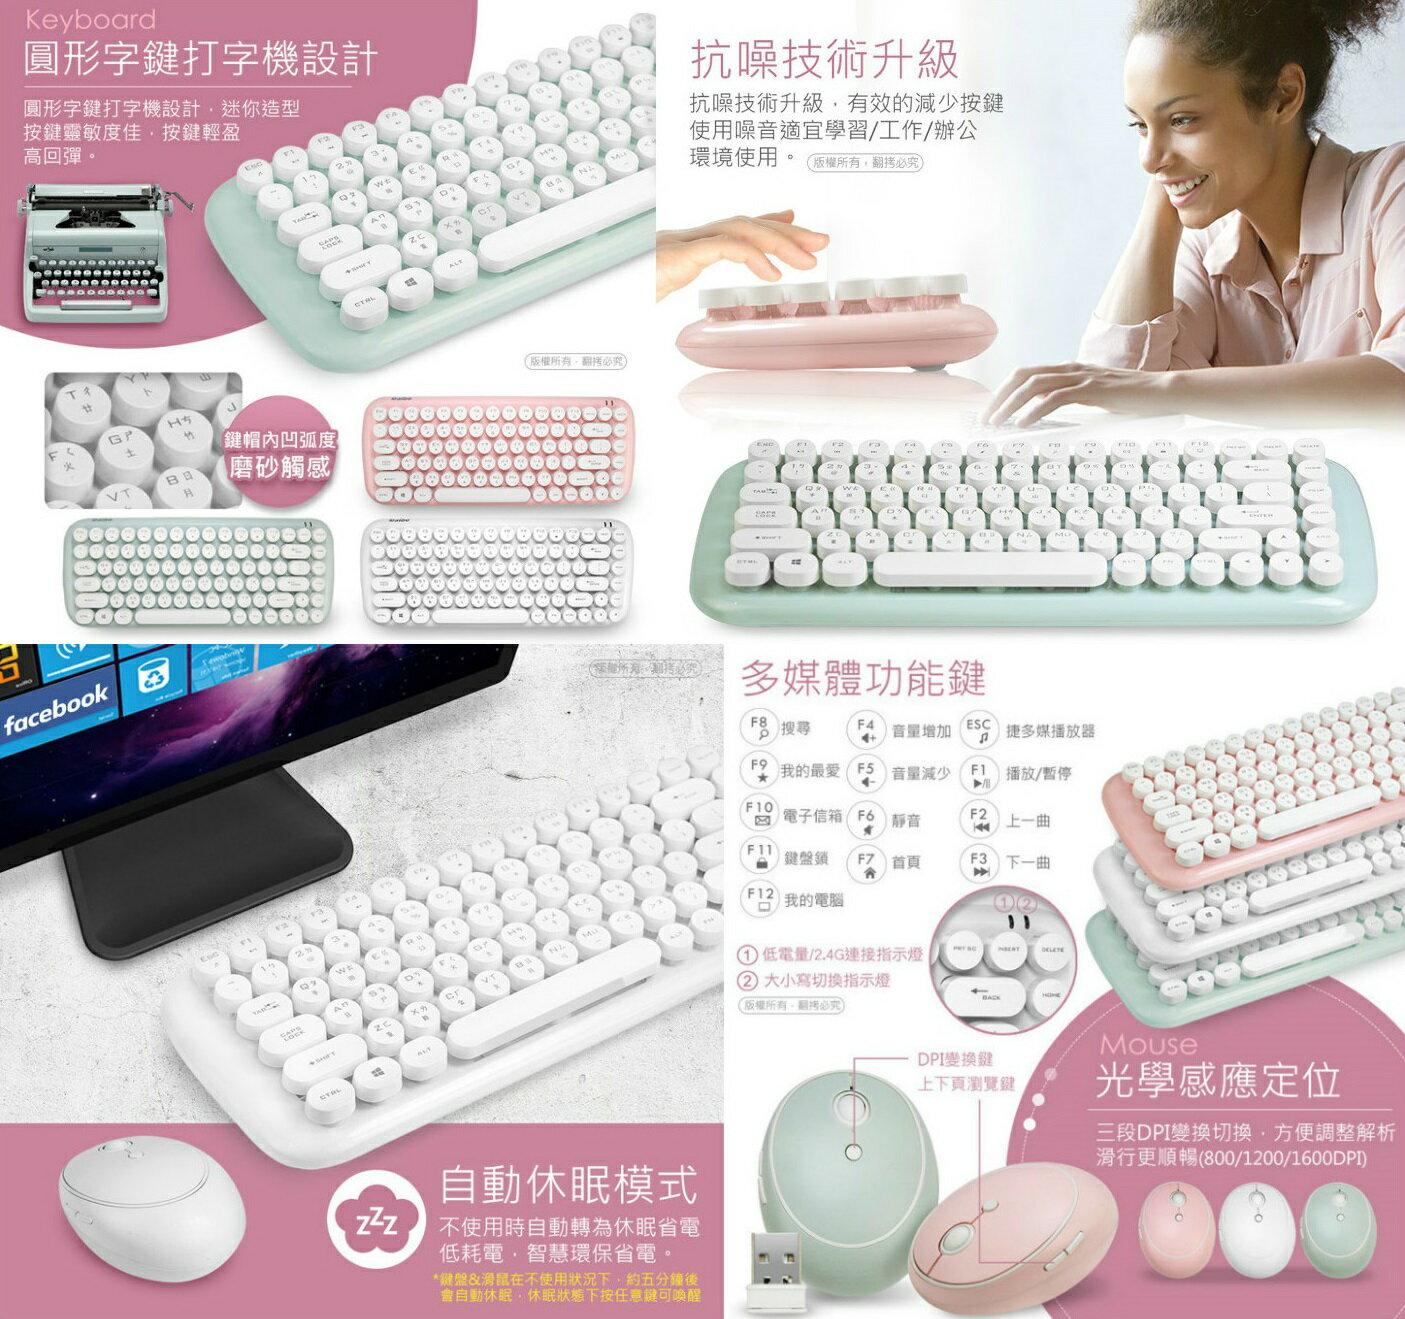 【Fun心玩】aibo 鈞嵐 KM12 棉花糖打字機 2.4G 無線 鍵盤滑鼠組 可愛造型 鍵鼠組 自動休眠省電